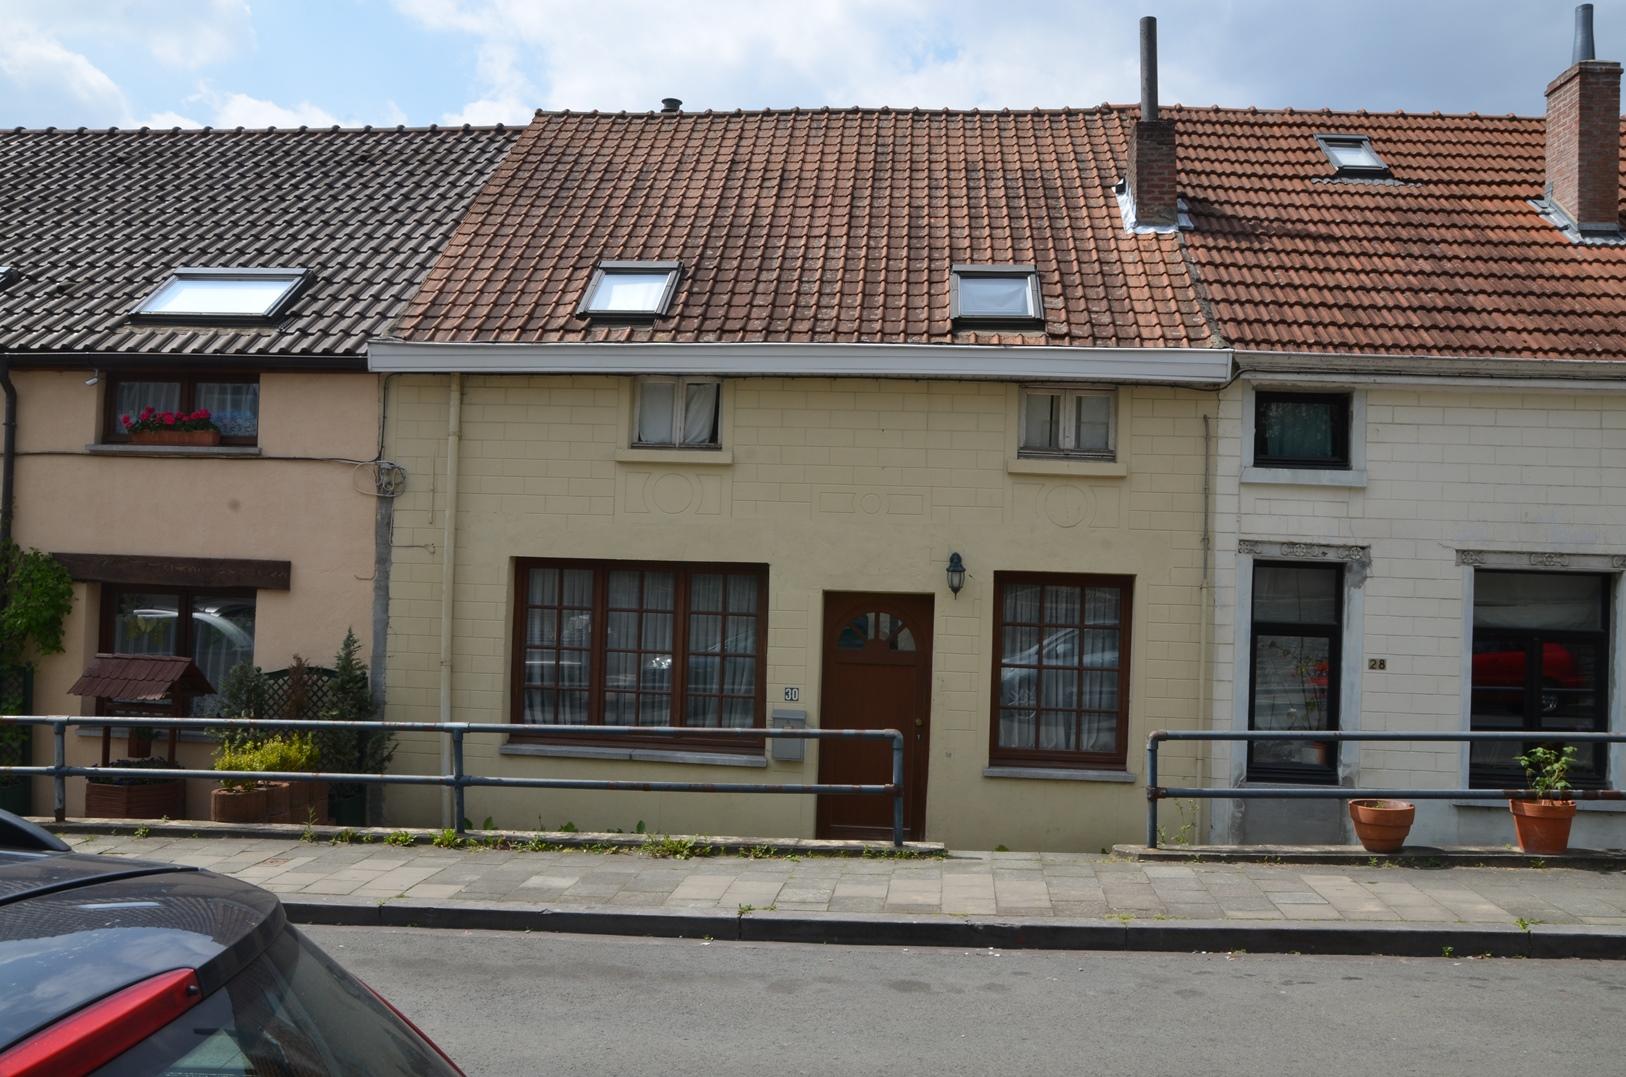 Rue de Flodorp 30